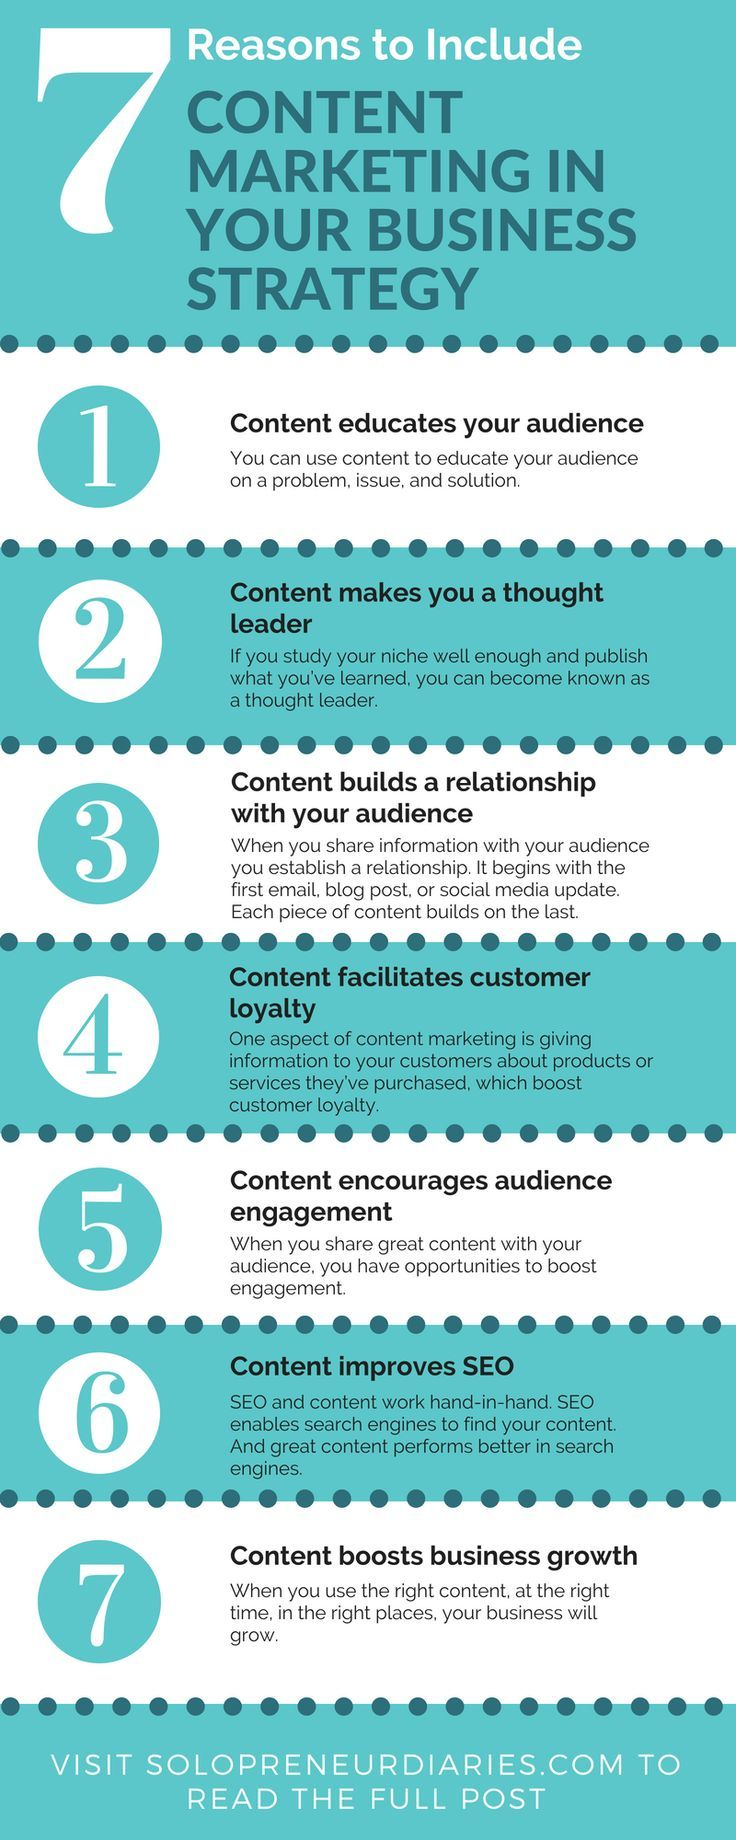 Content Marketing Basics for Solopreneurs